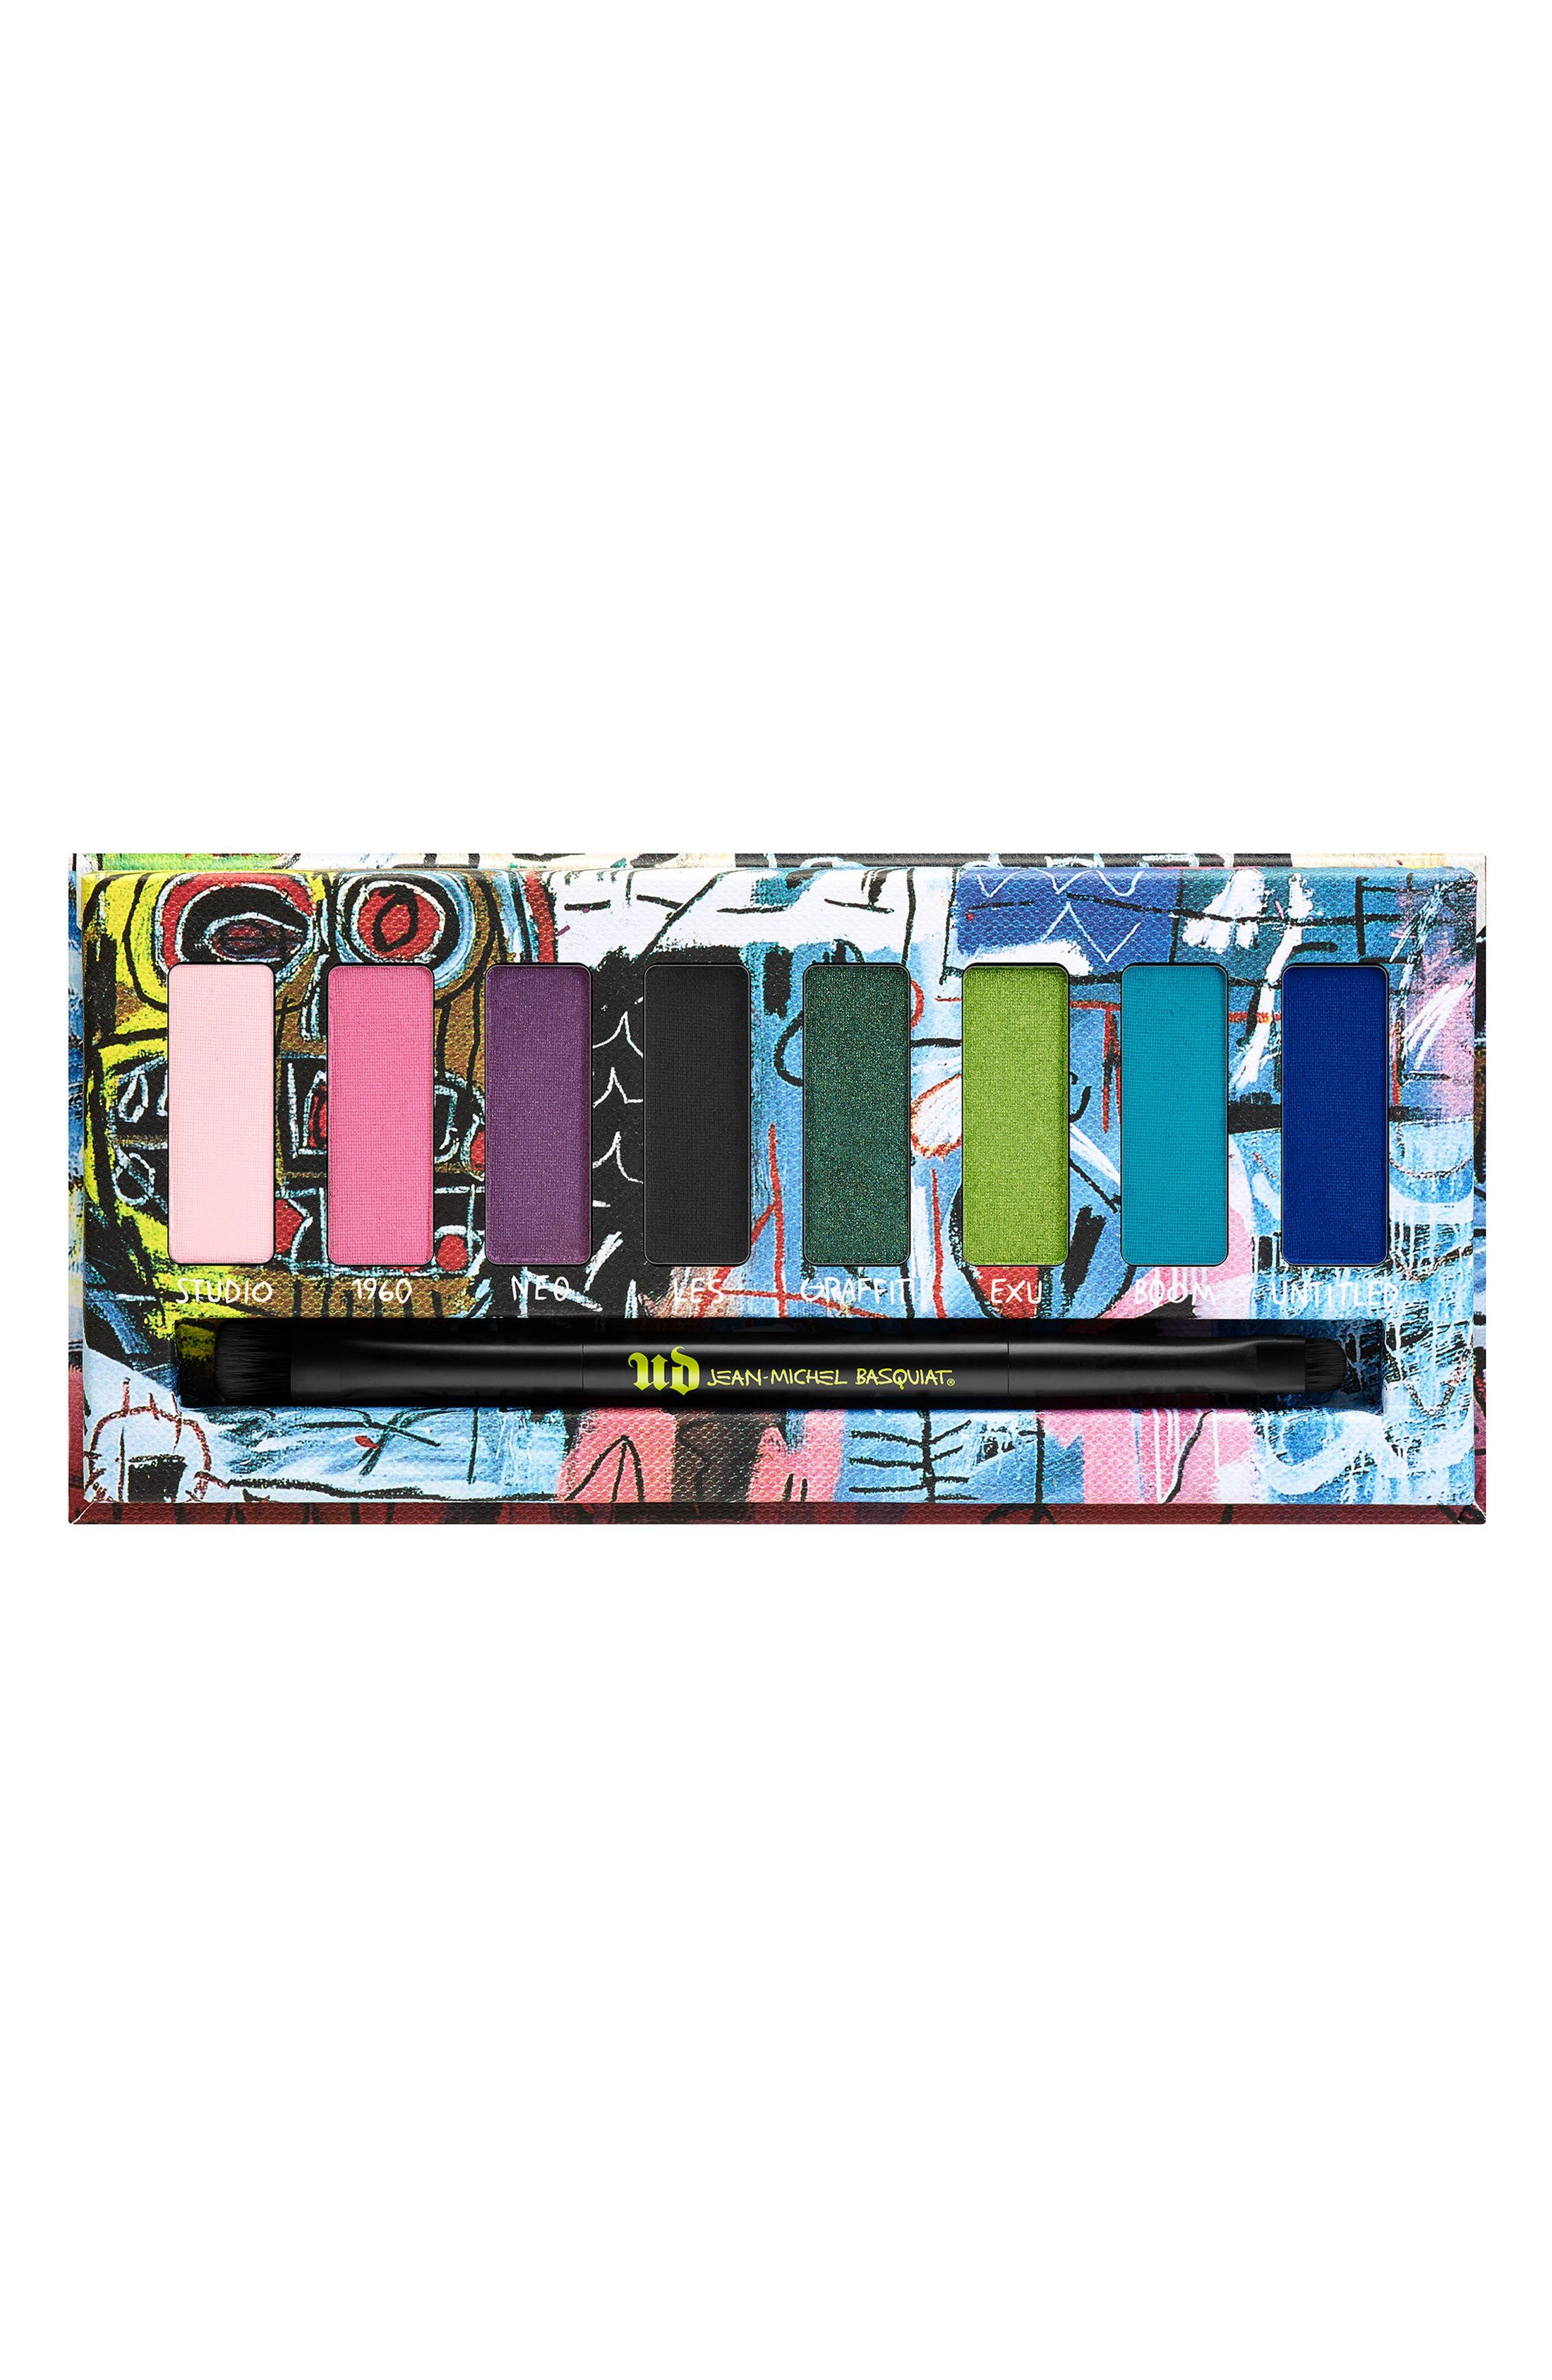 Alternate Image 1 Selected - Urban Decay Jean-Michel Basquiat Tenant Eyeshadow Palette